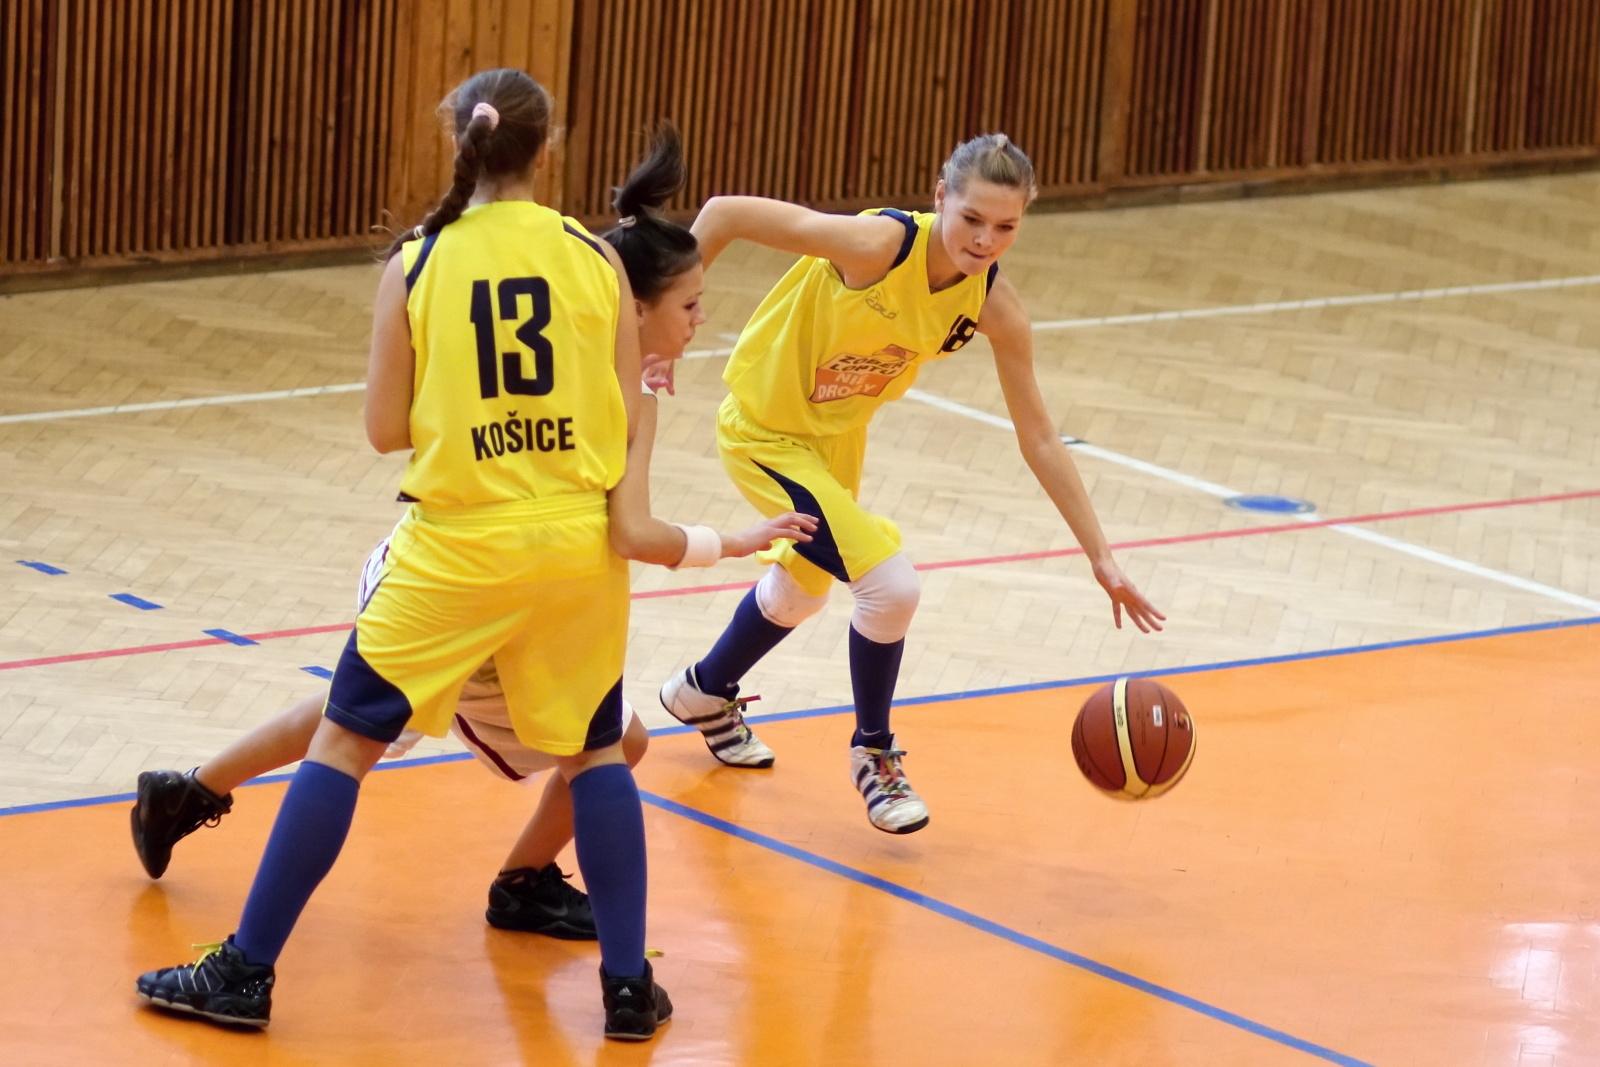 bk-zvolen-tydam-kosice-ziacky-basketbal-2011-2